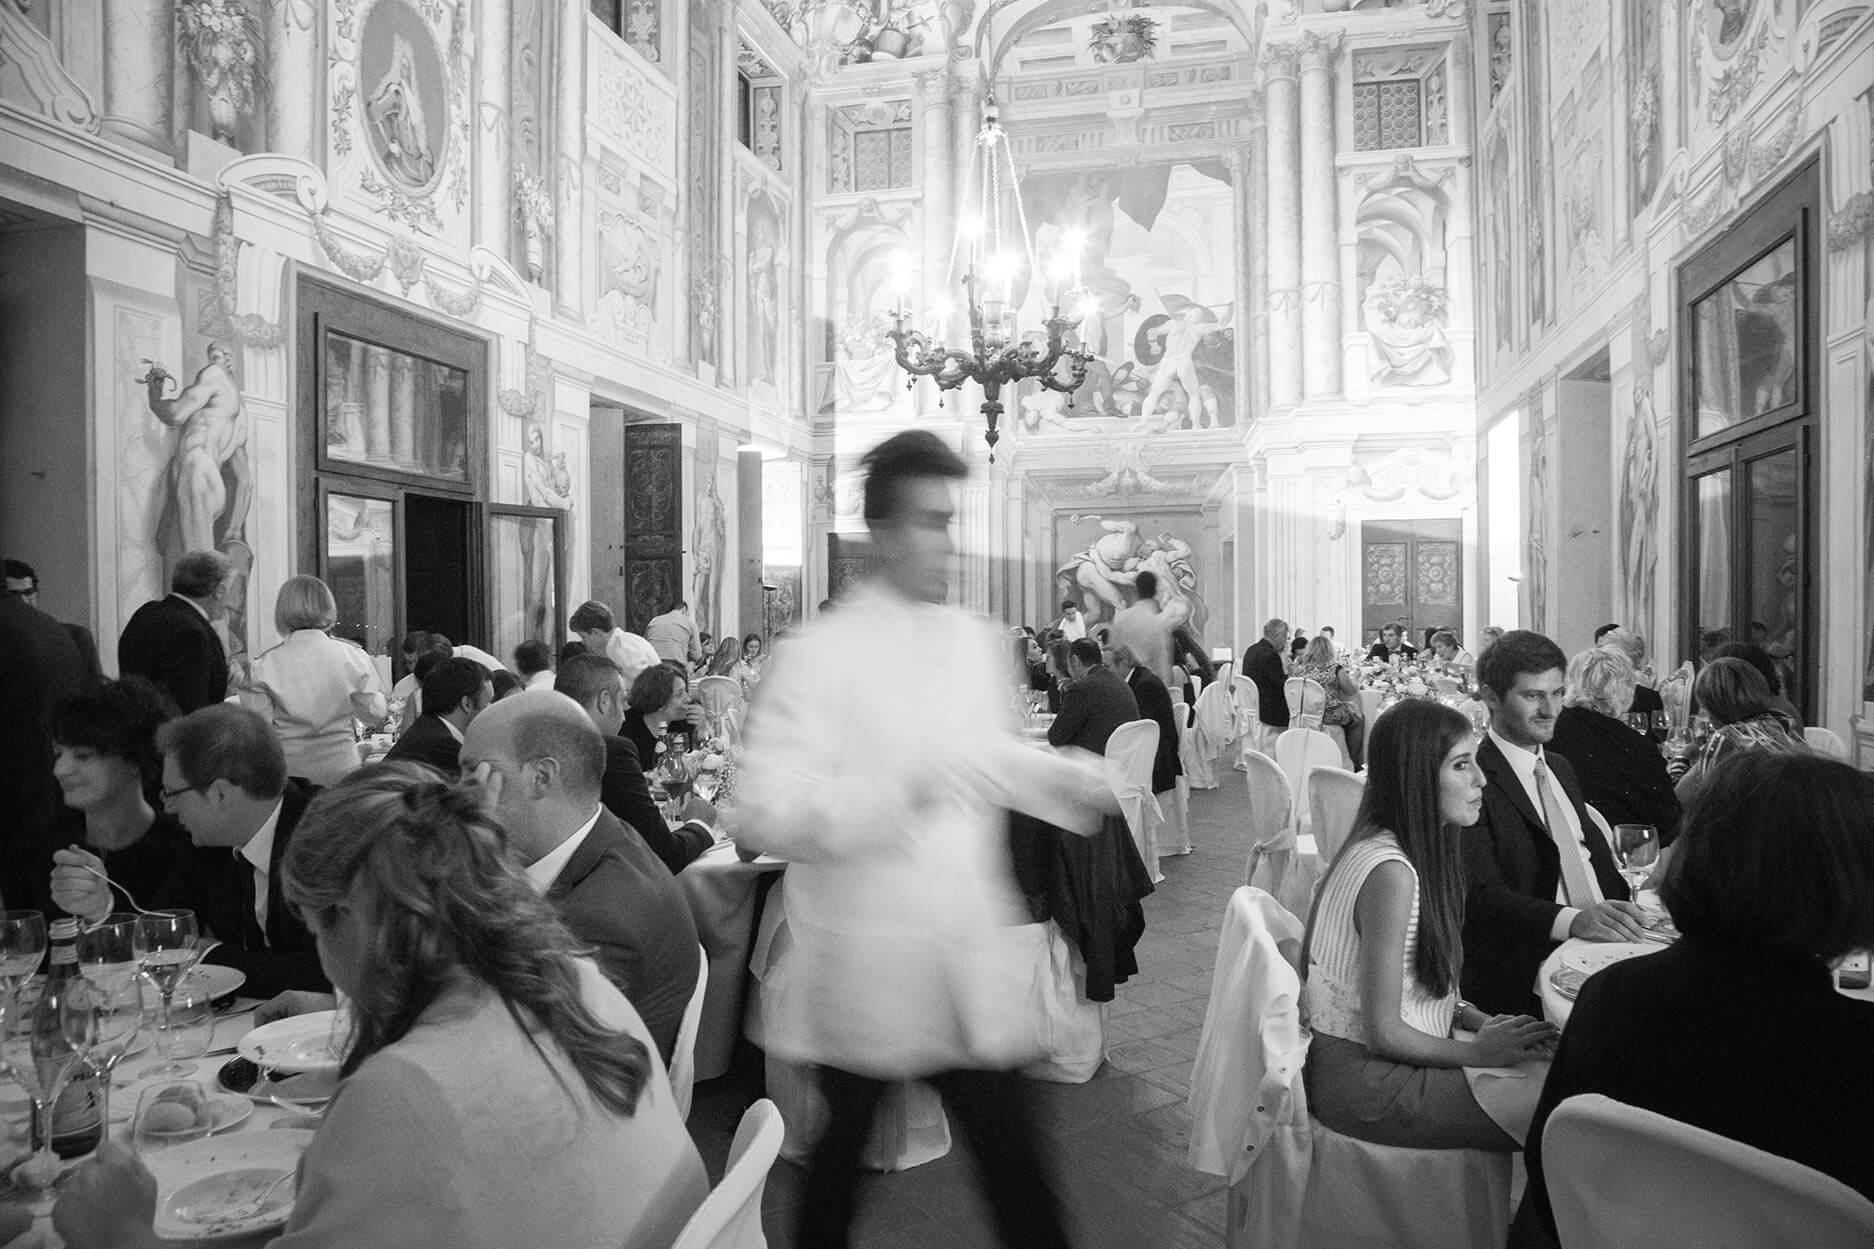 Francesca-Ferrati-wedding-photographer-Verona-Svetlana-Gianluigi2